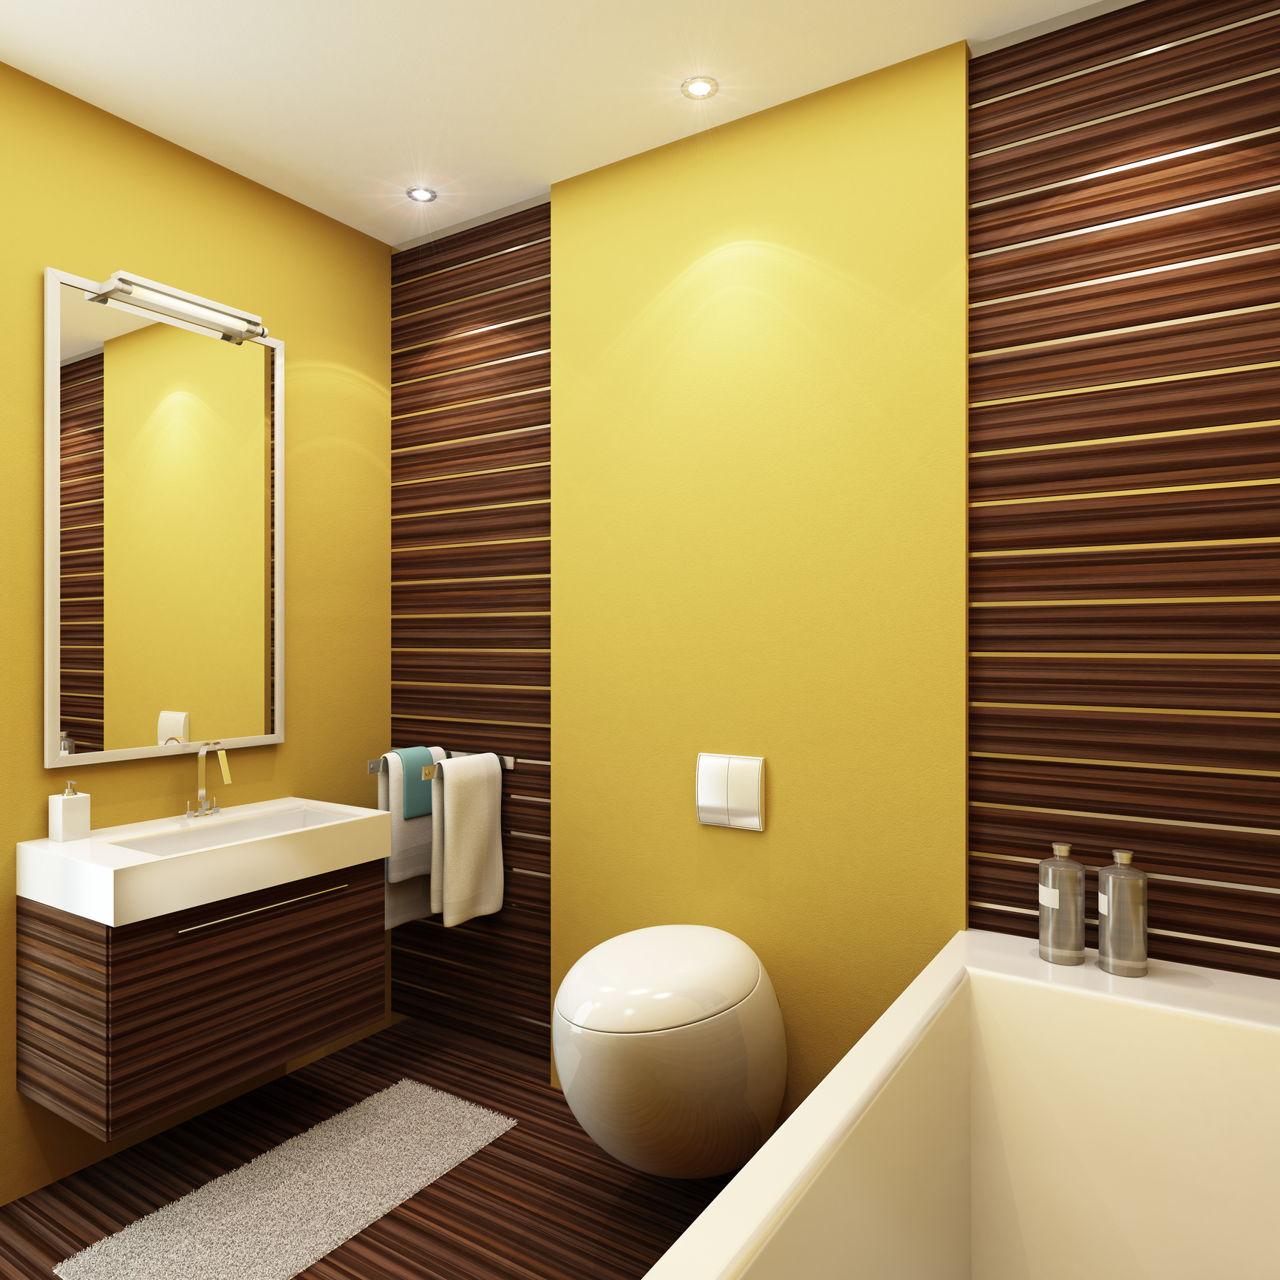 Small Bathrooms Makeover: Lavish Small Bathroom Makeover Ideas To Jazz Up Your Bath Area